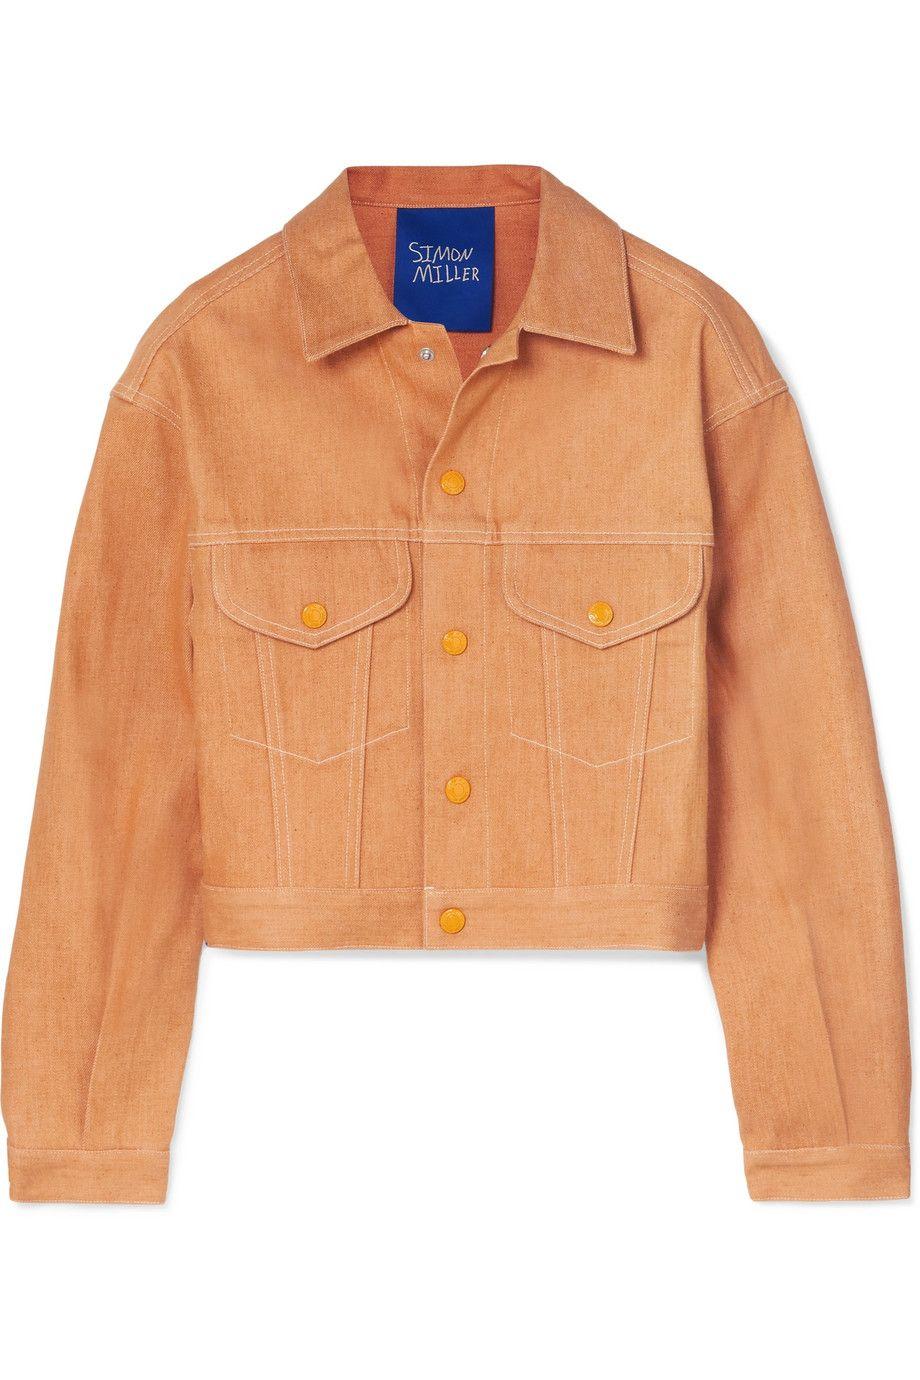 Simon Miller Morgo Cropped Denim Jacket Net A Porter Com Cropped Denim Jacket Denim Jacket Cropped Denim [ 1380 x 920 Pixel ]